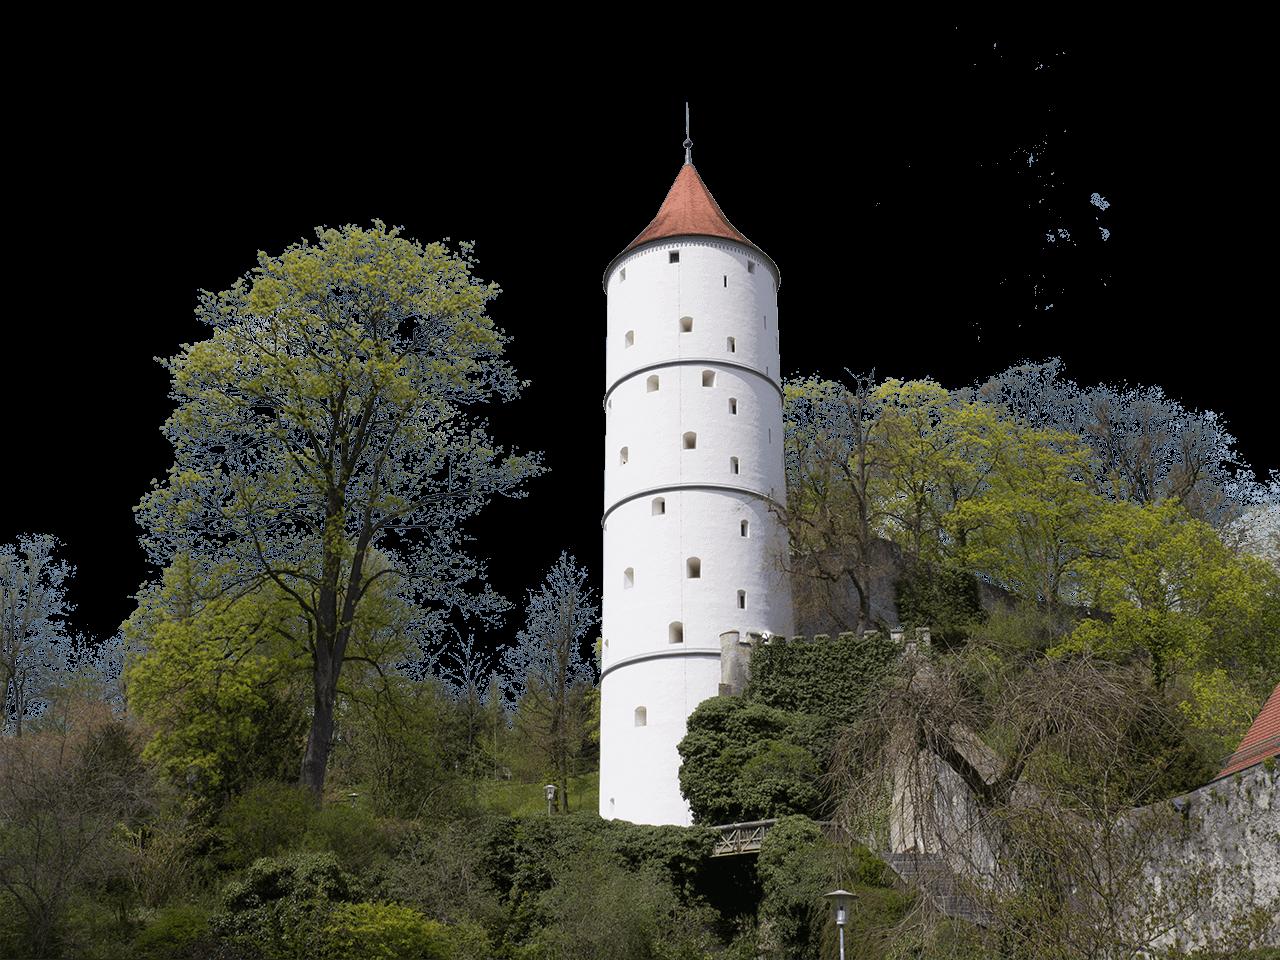 Weisser Turm Praxis Zahnaerzte Biberach